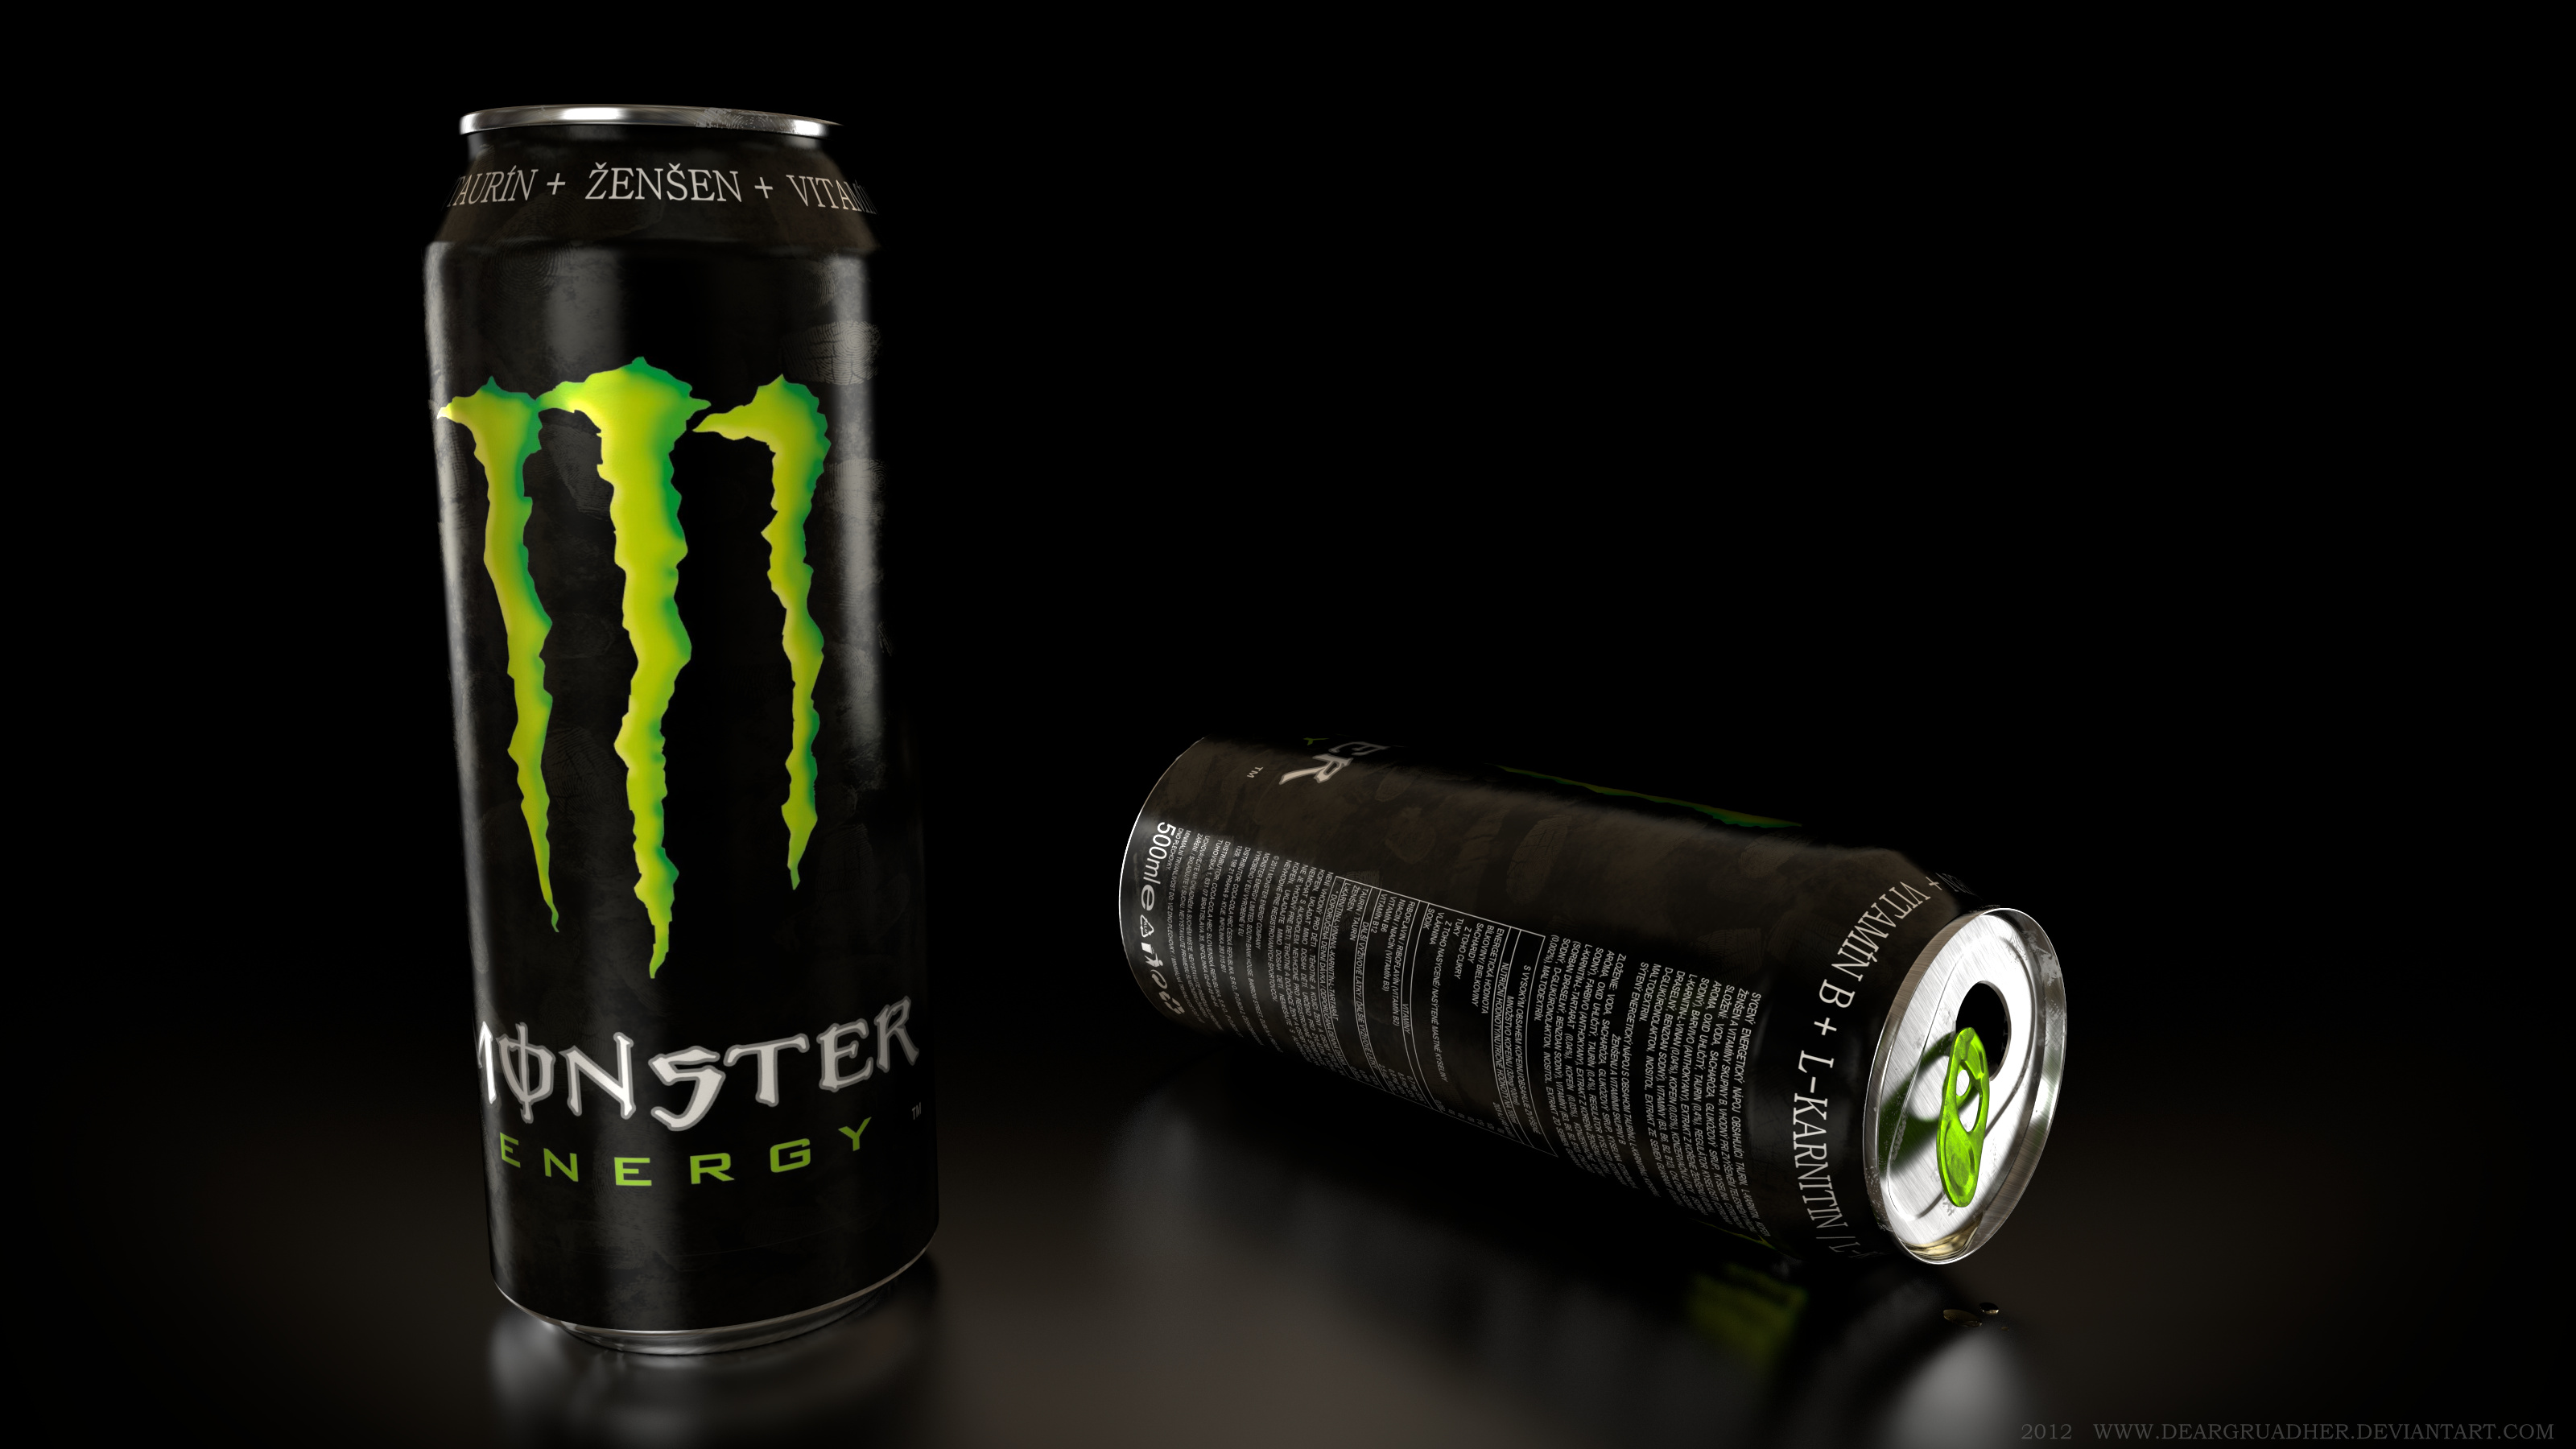 monster_energy_drink_by_deargruadher-d583mf1.jpg